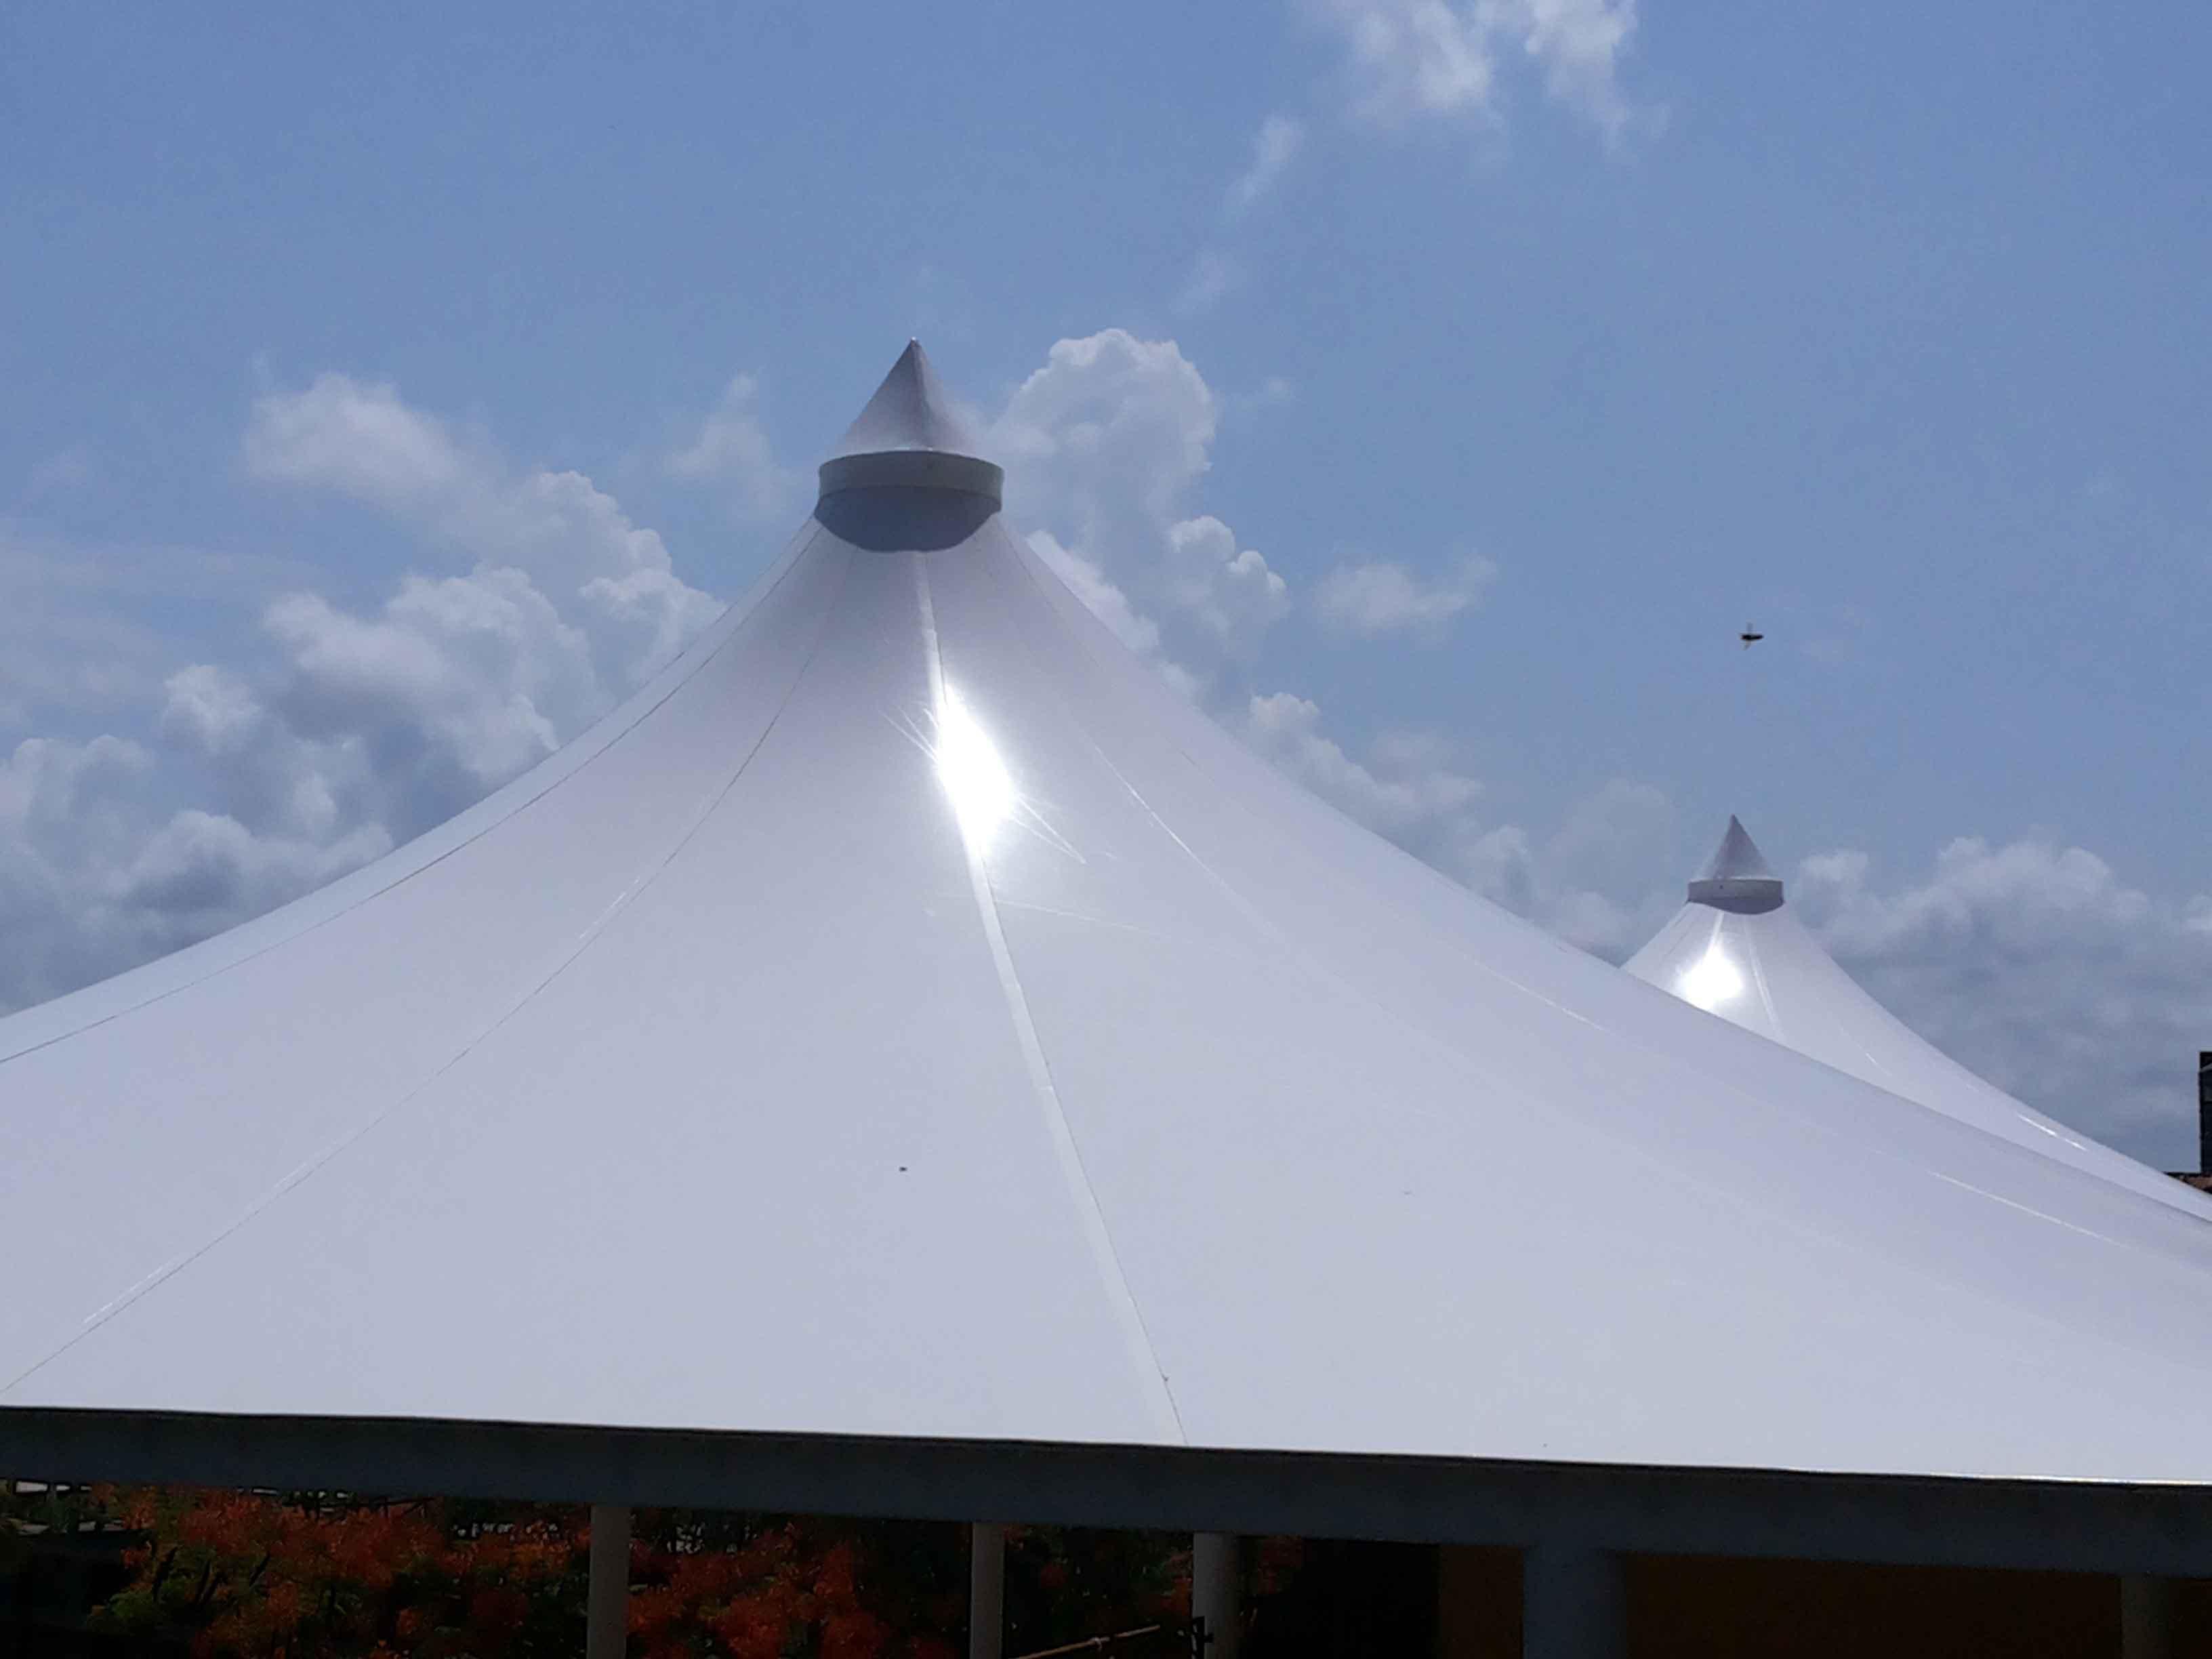 simca india terrace roof conical fabric structure goa, india